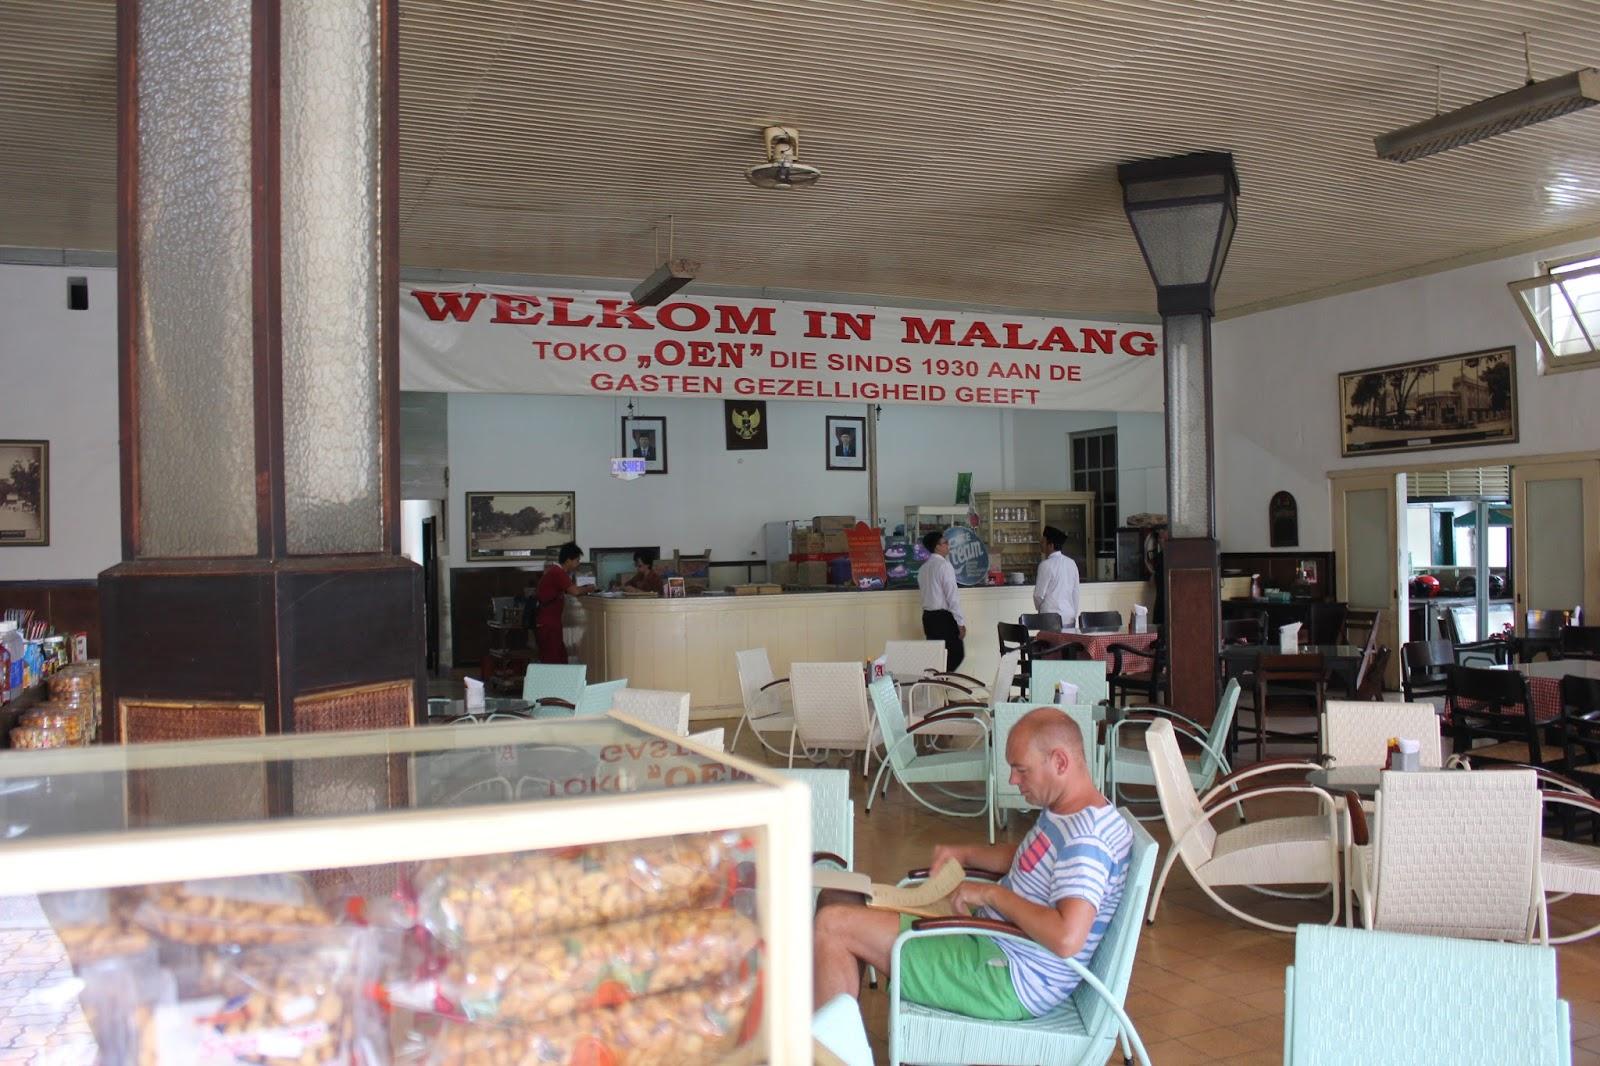 Toko Oen, Toko Oen Malang, Kota Malang, Dolan Dolen, Dolaners Toko Oen via Ardian Kusuma - Dolan Dolen